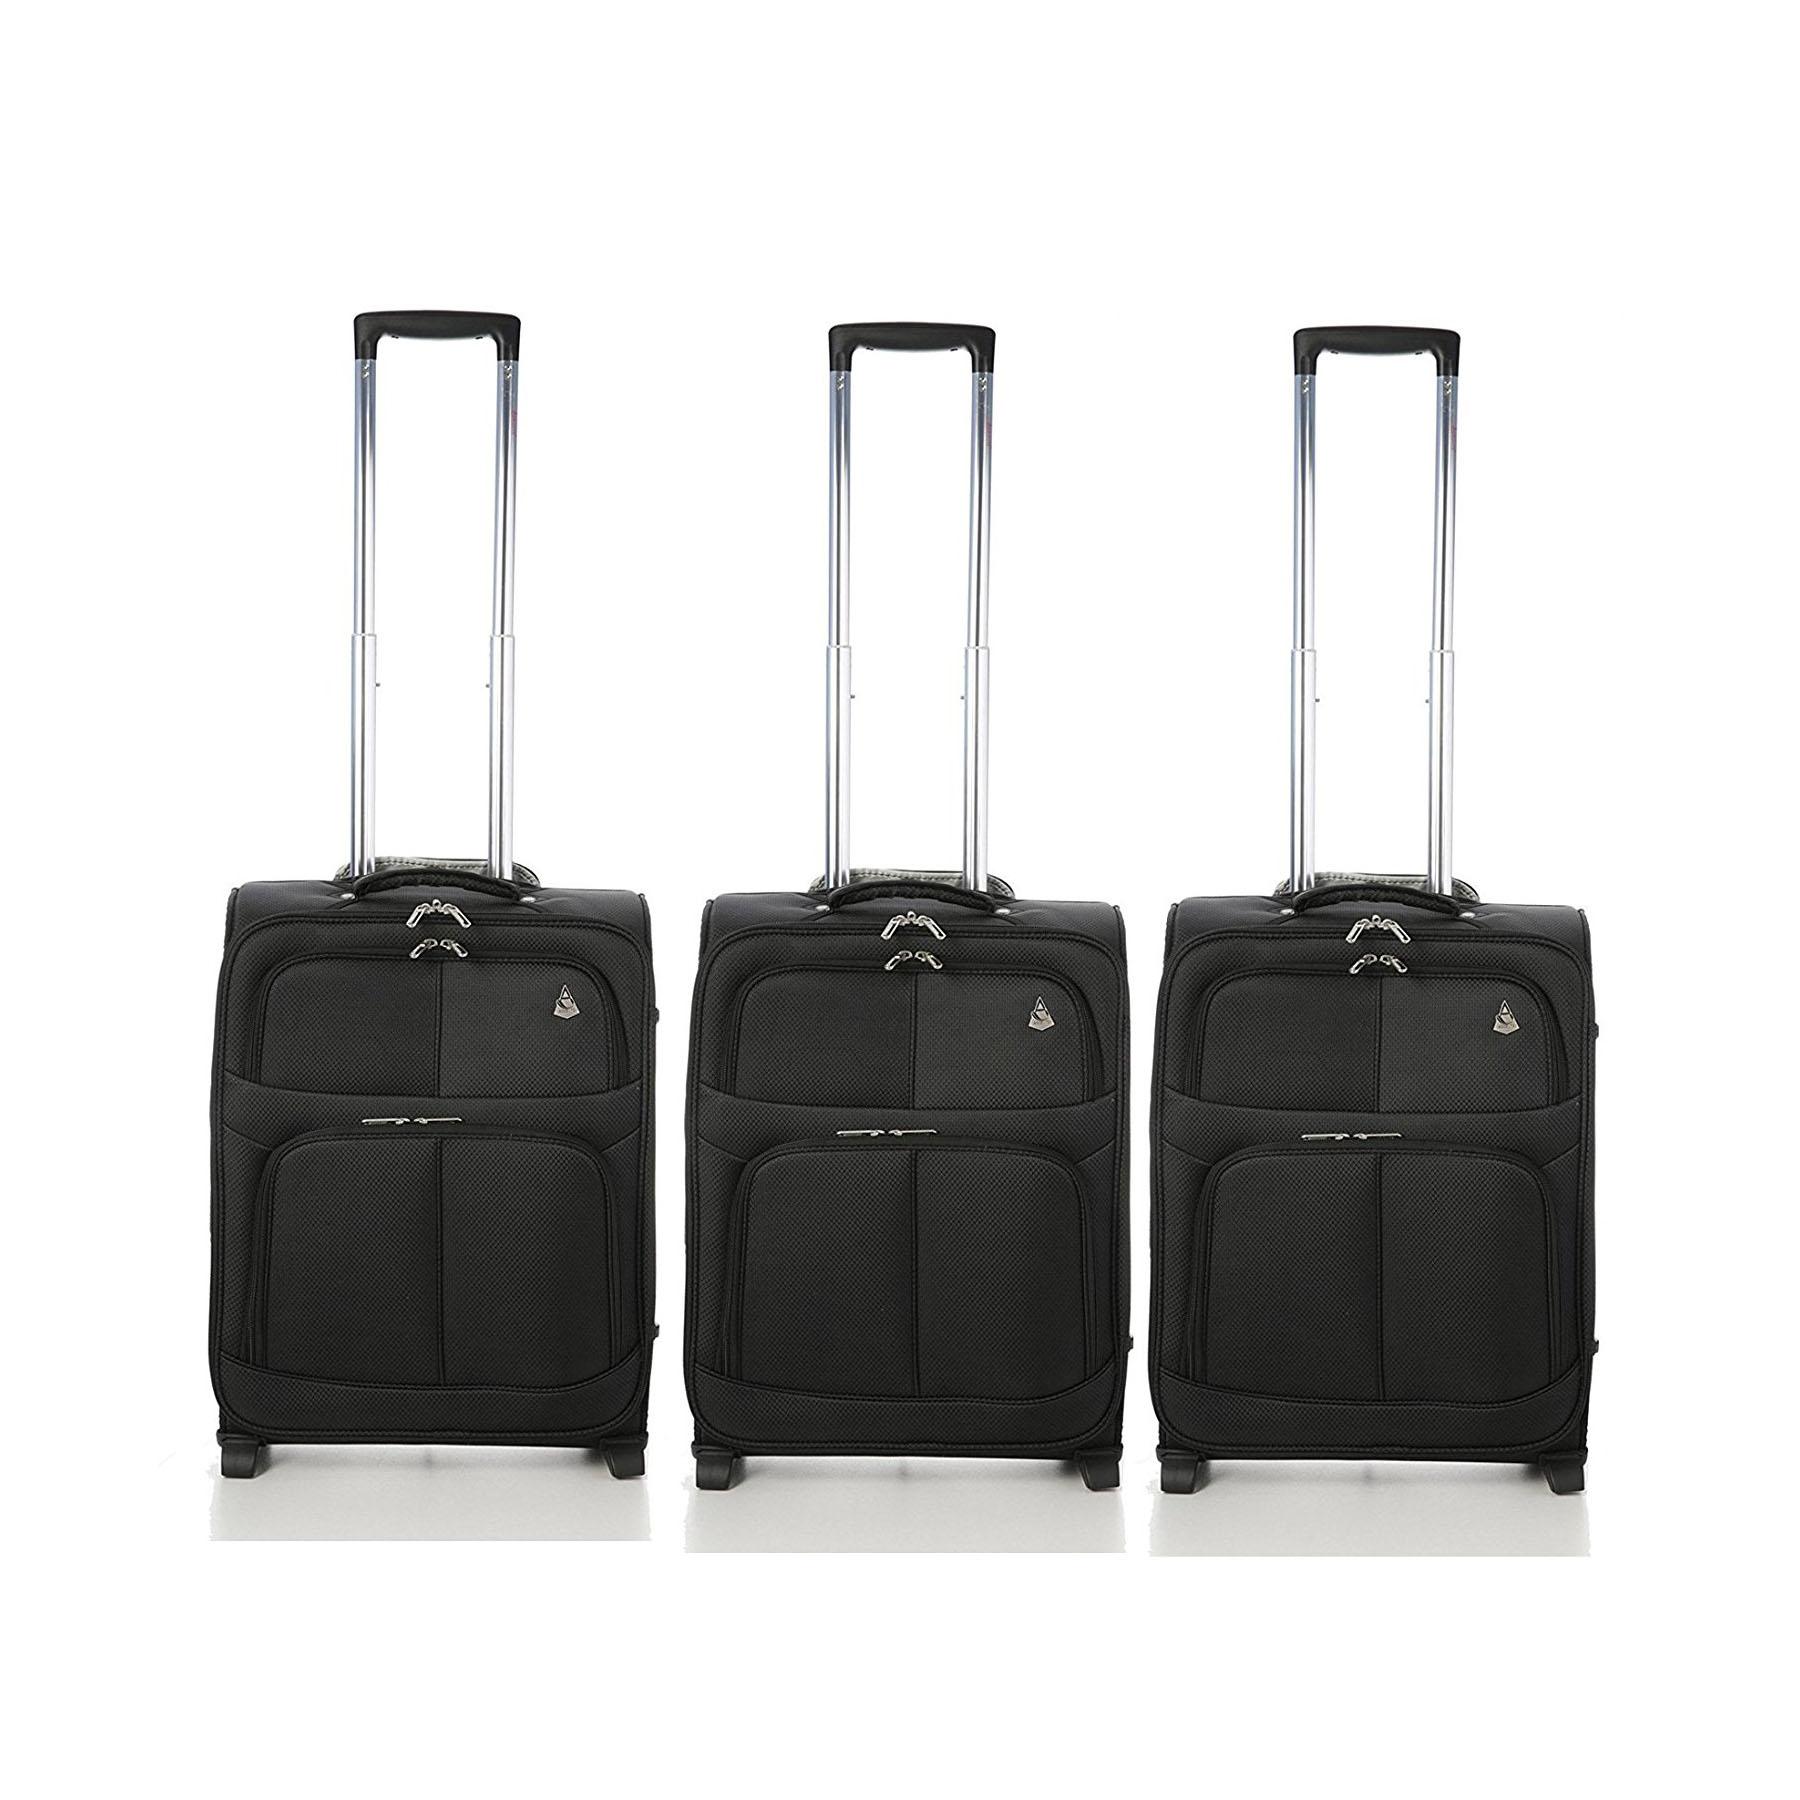 Aerolite 55x40x20 Super Lightweight Carry On Hand Suitcase 2 Wheels